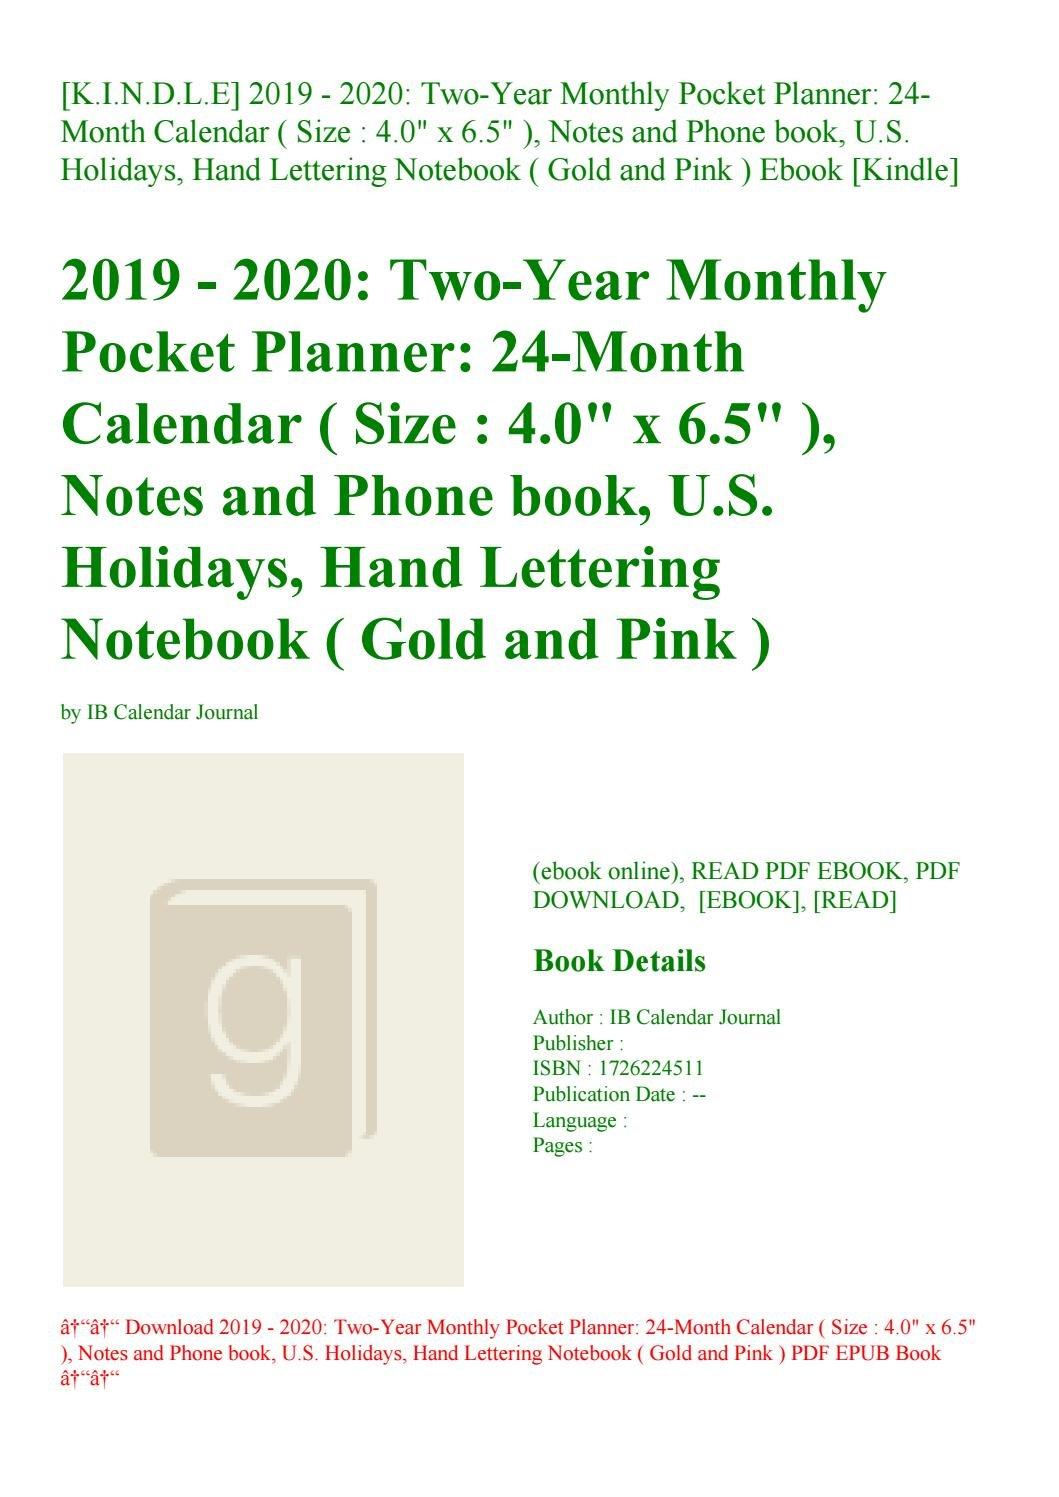 K.i.n.d.l.e] 2019 – 2020 Two Year Monthly Pocket Planner 24 Month U Of L Calendar 2019